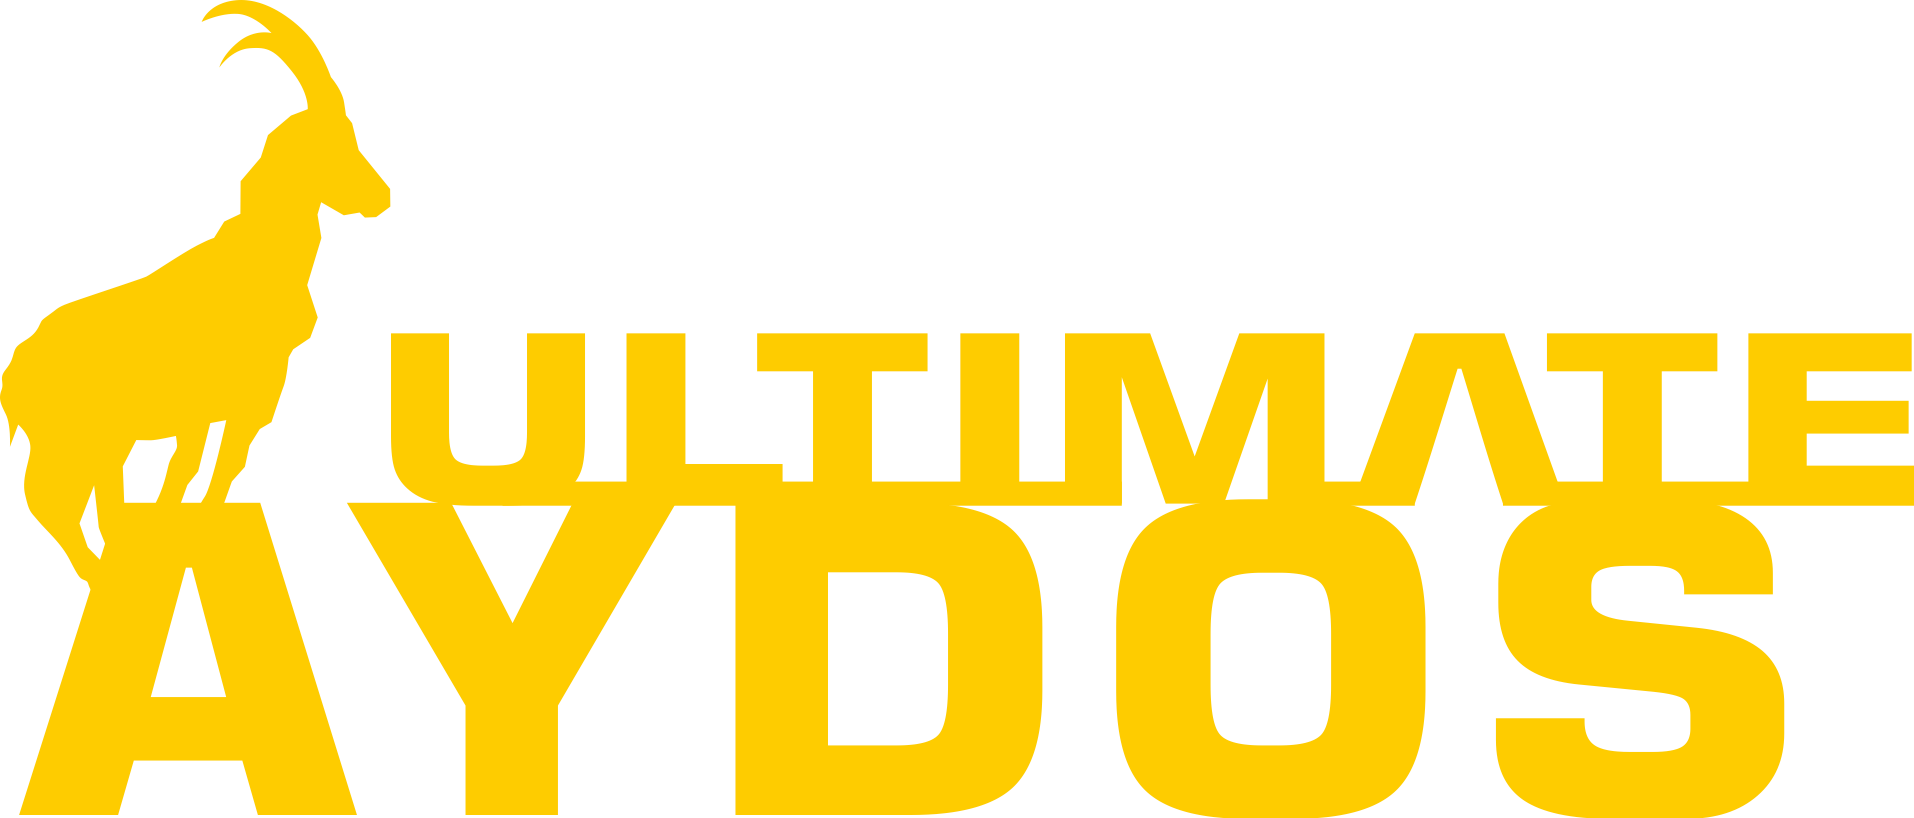 https://teamkronos.com/wp-content/uploads/2021/01/sarı-ultimate-aydos.png